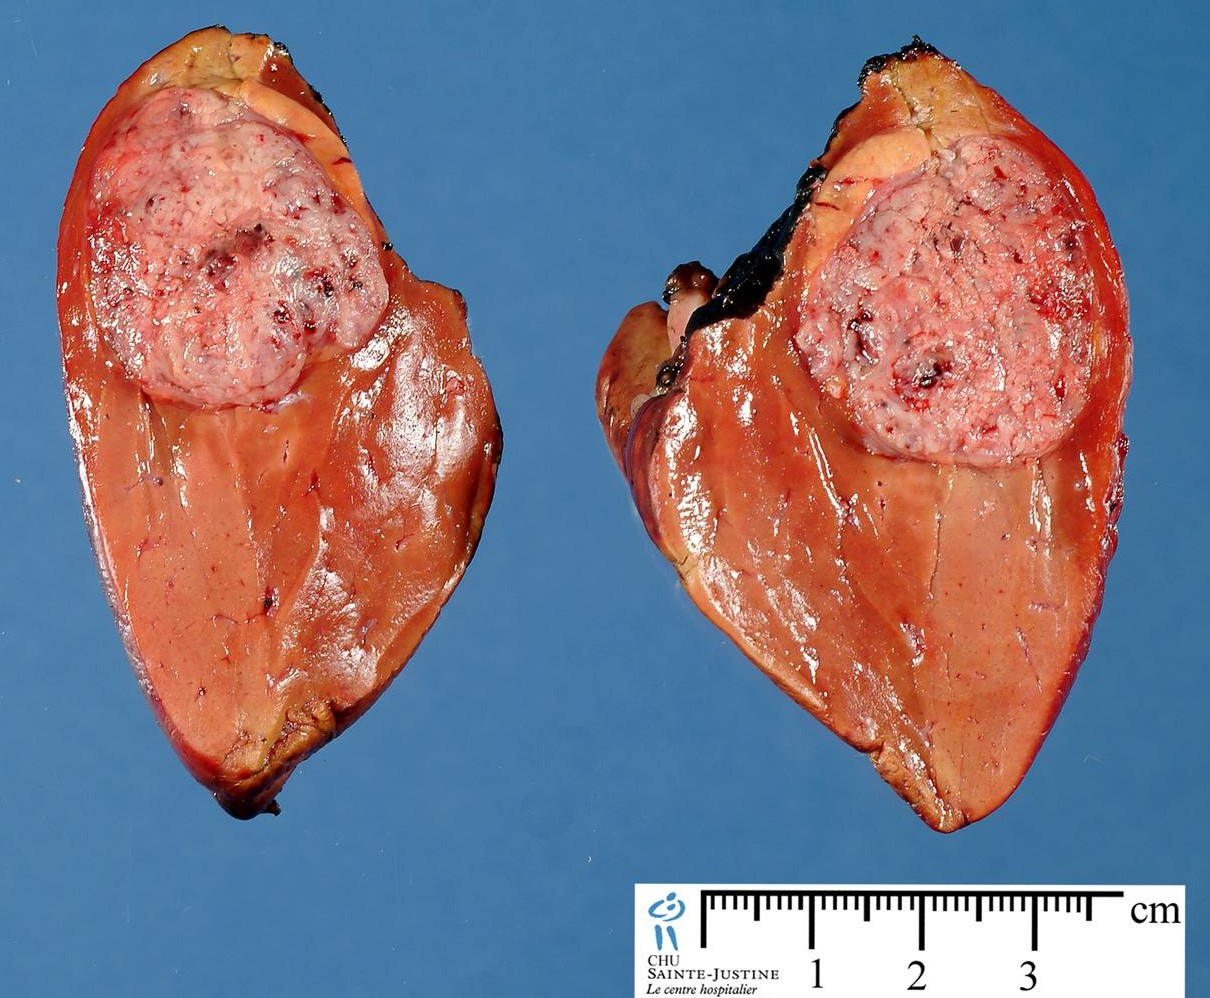 hepatoblastoma - Humpath com - Human pathology